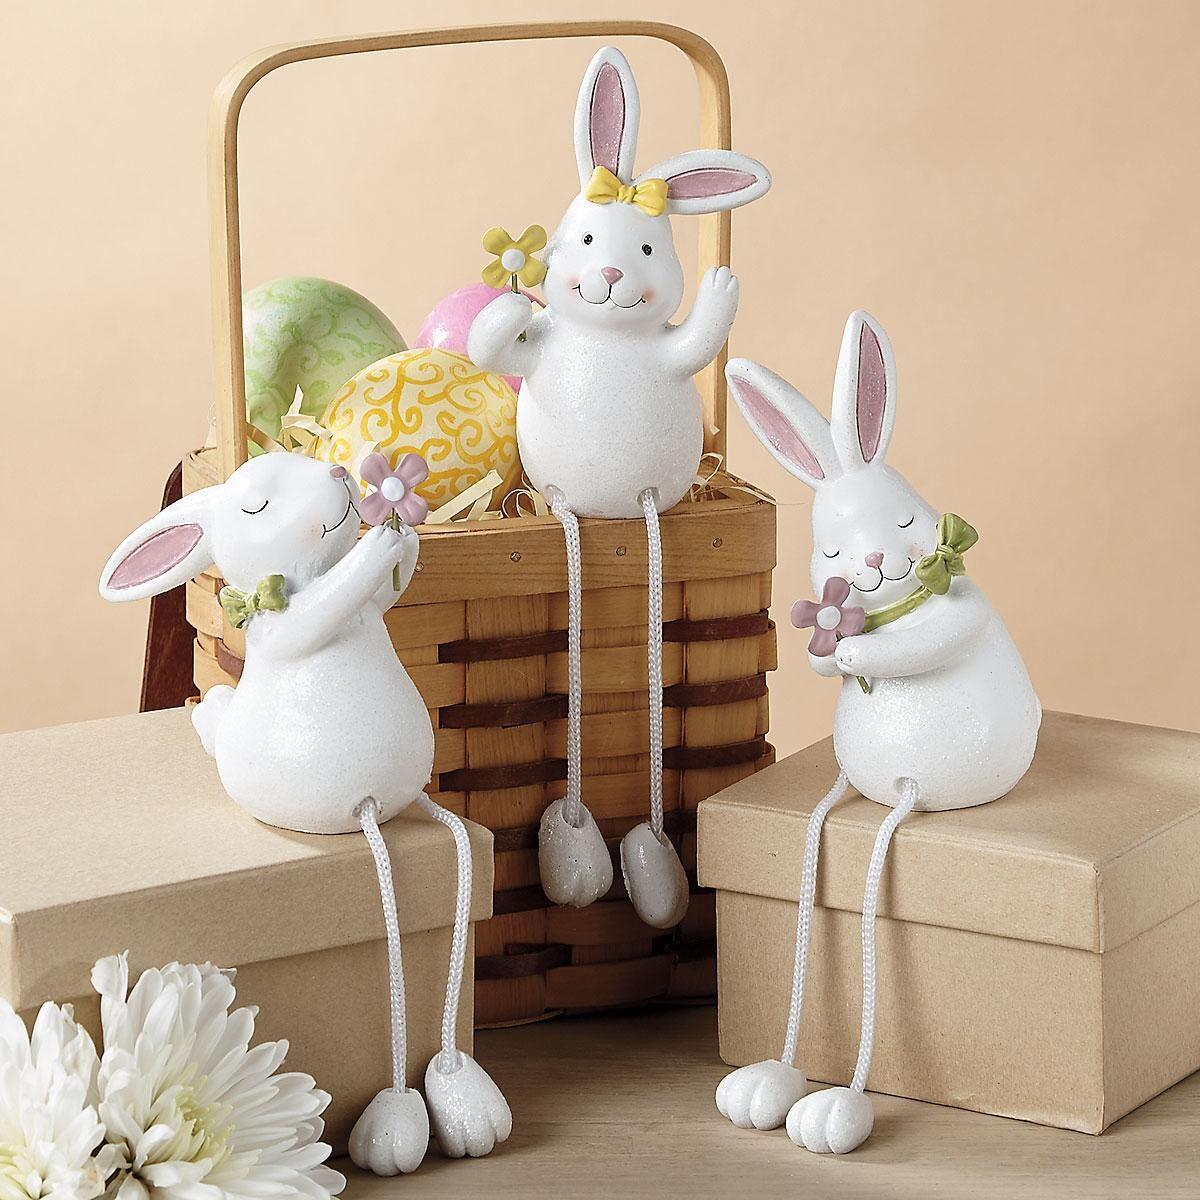 Shelf Sitter Bunnies with Dangling Legs